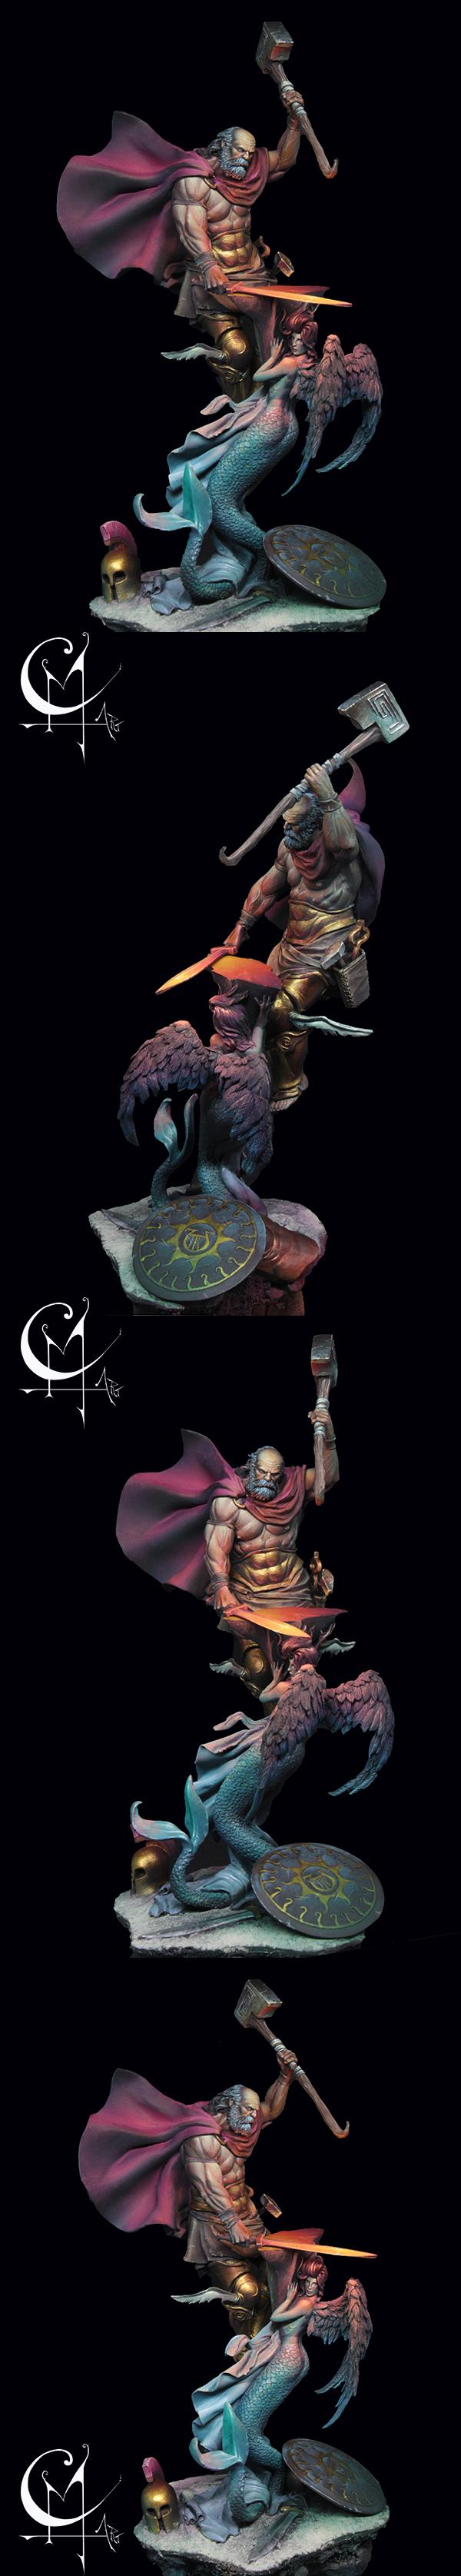 Hephaestus- the Blacksmith of the Olympus